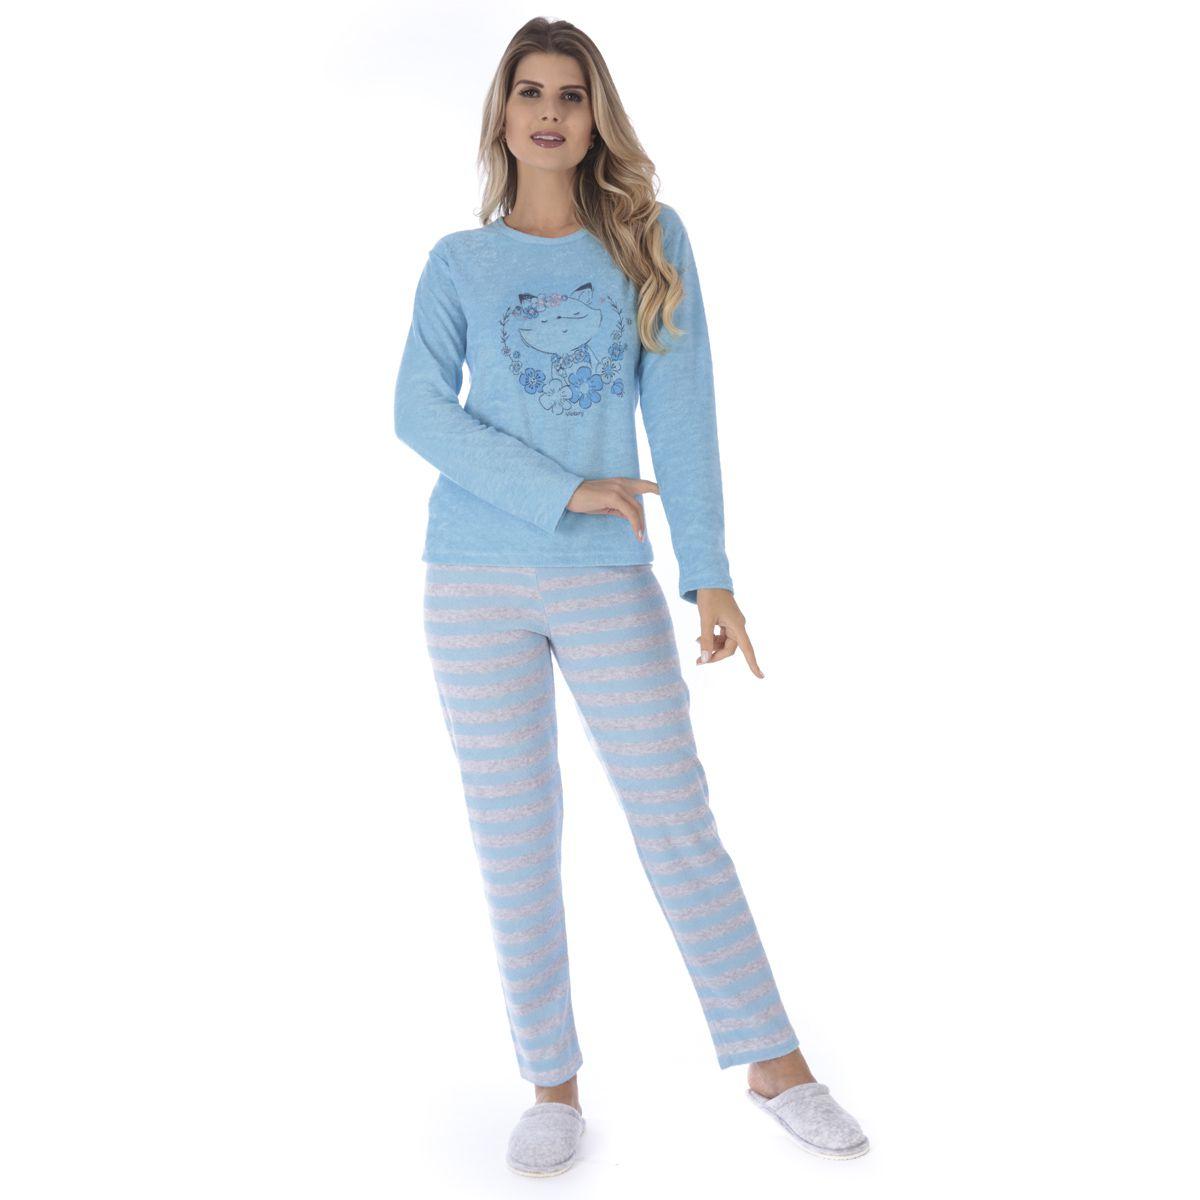 Pijama de inverno feminino LISTRADO Victory